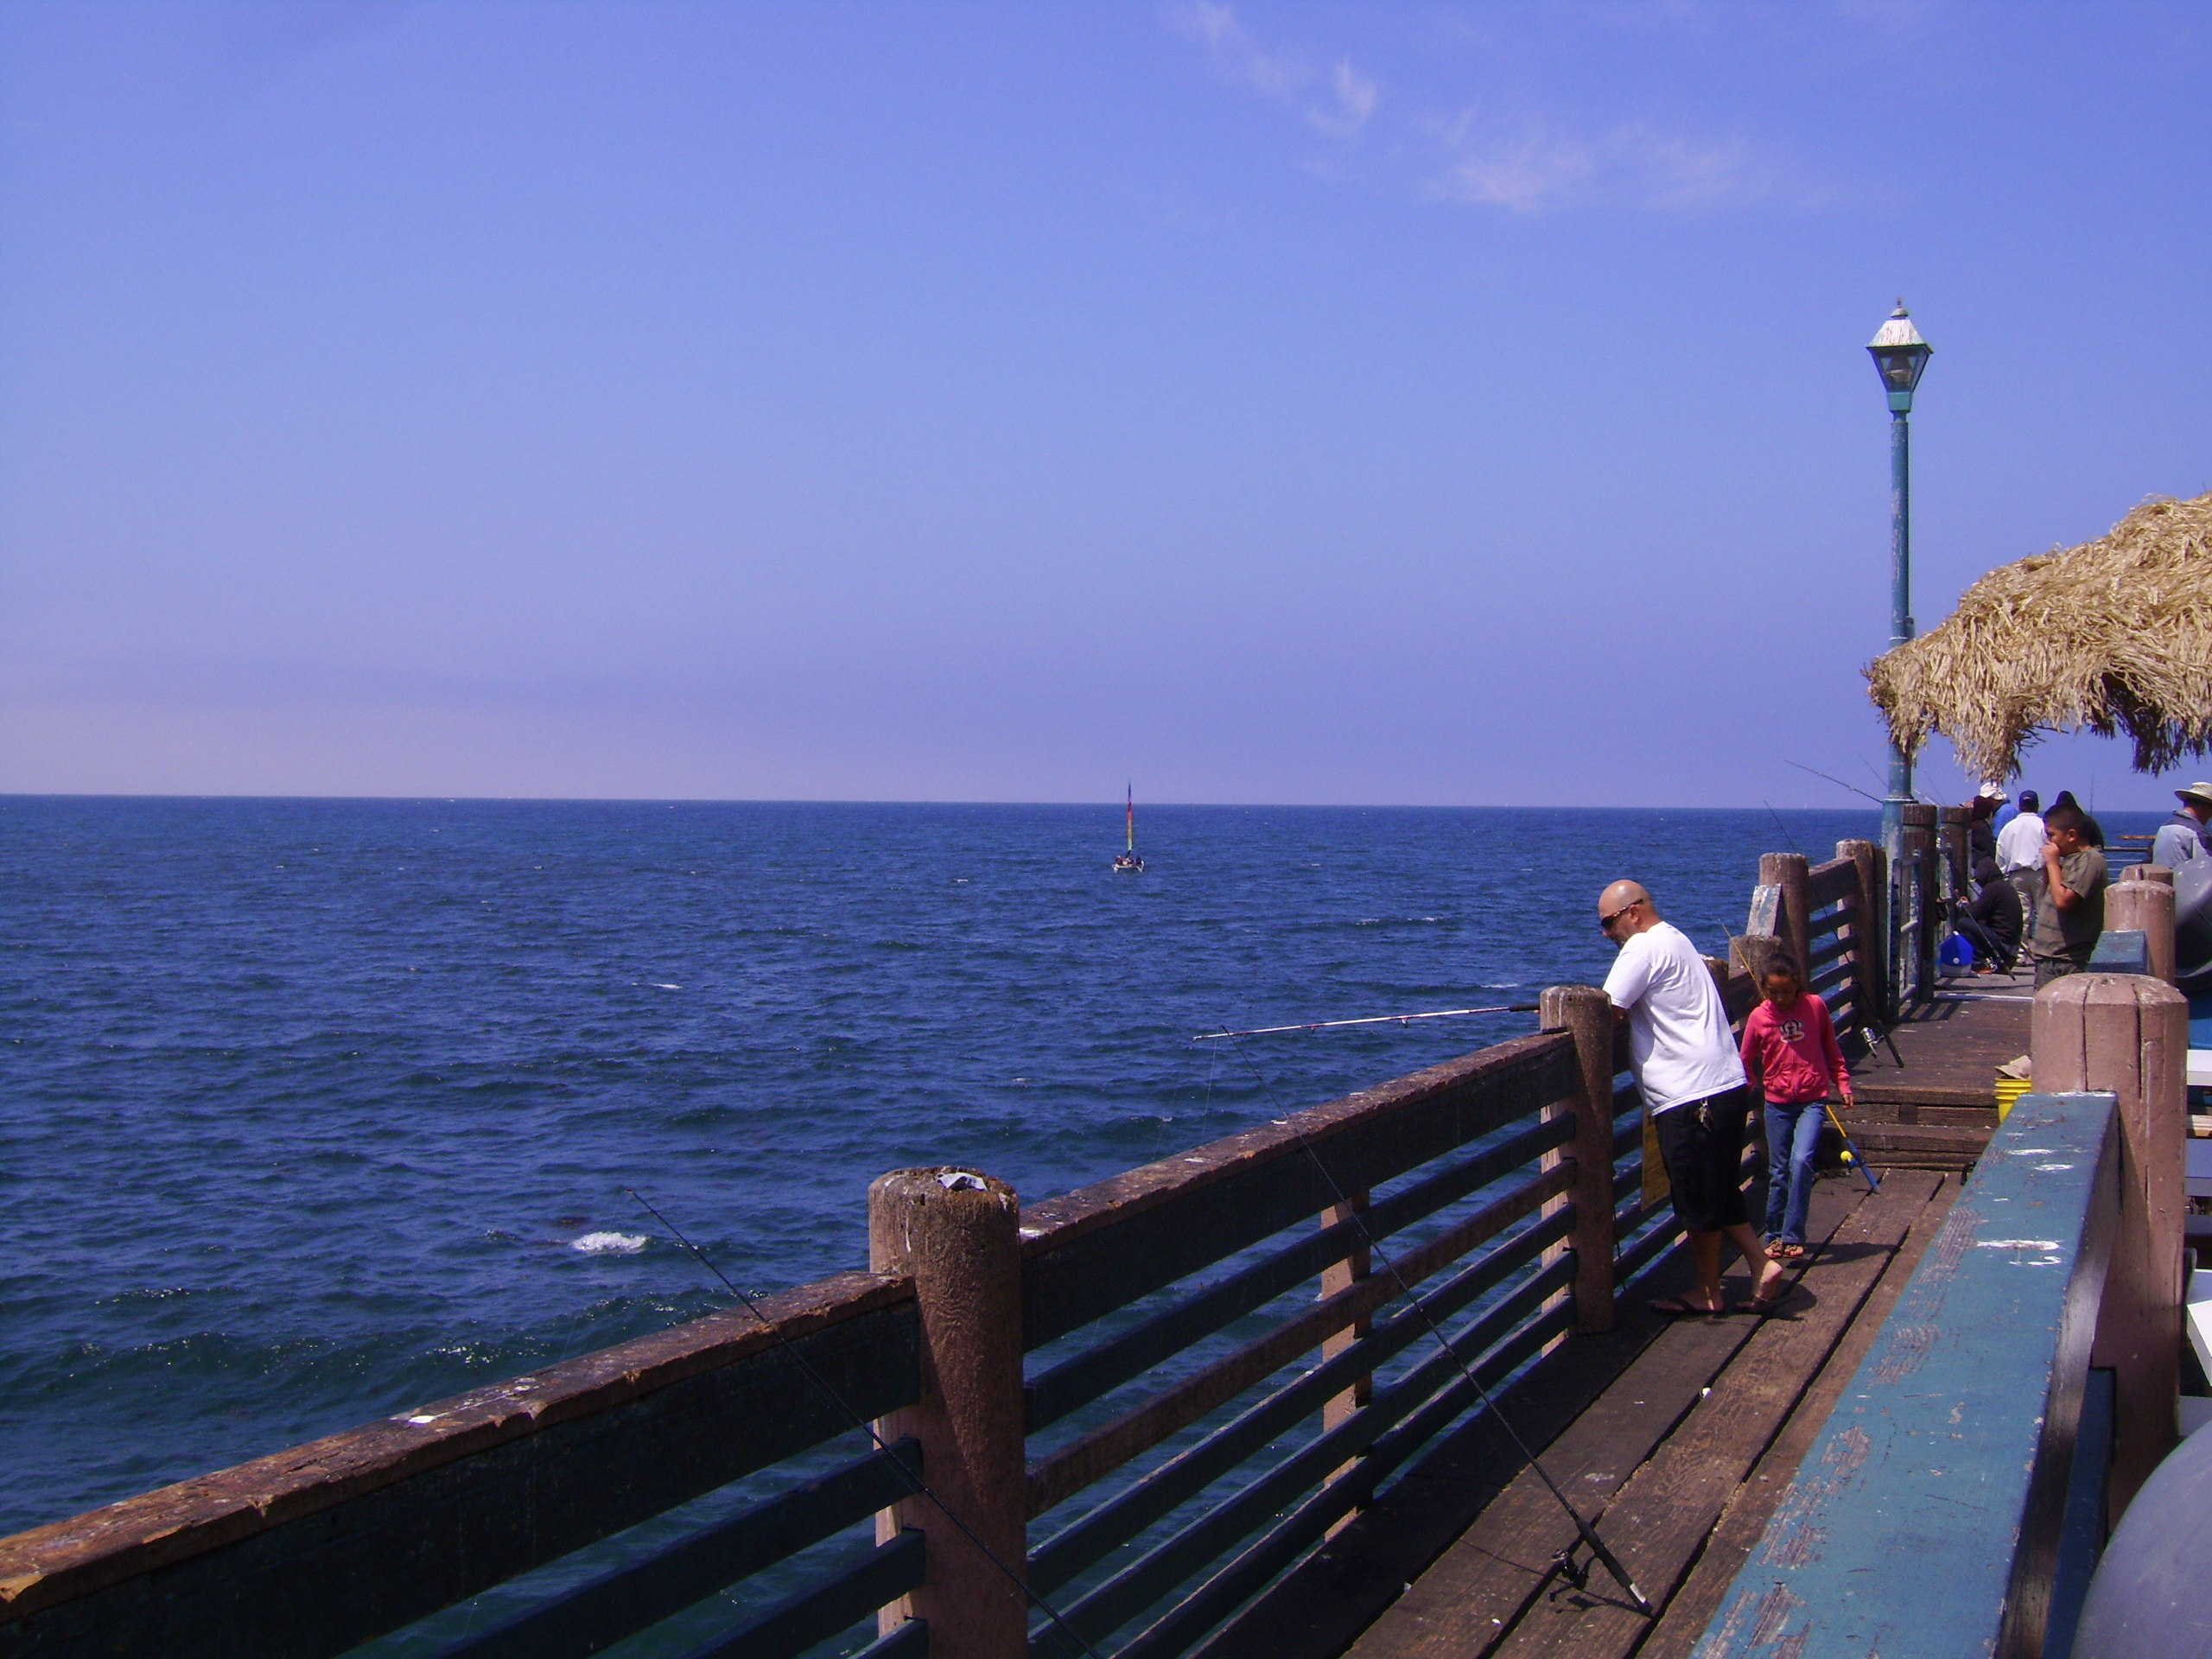 More than enough reasons to visit redondo beach for Redondo beach pier fishing